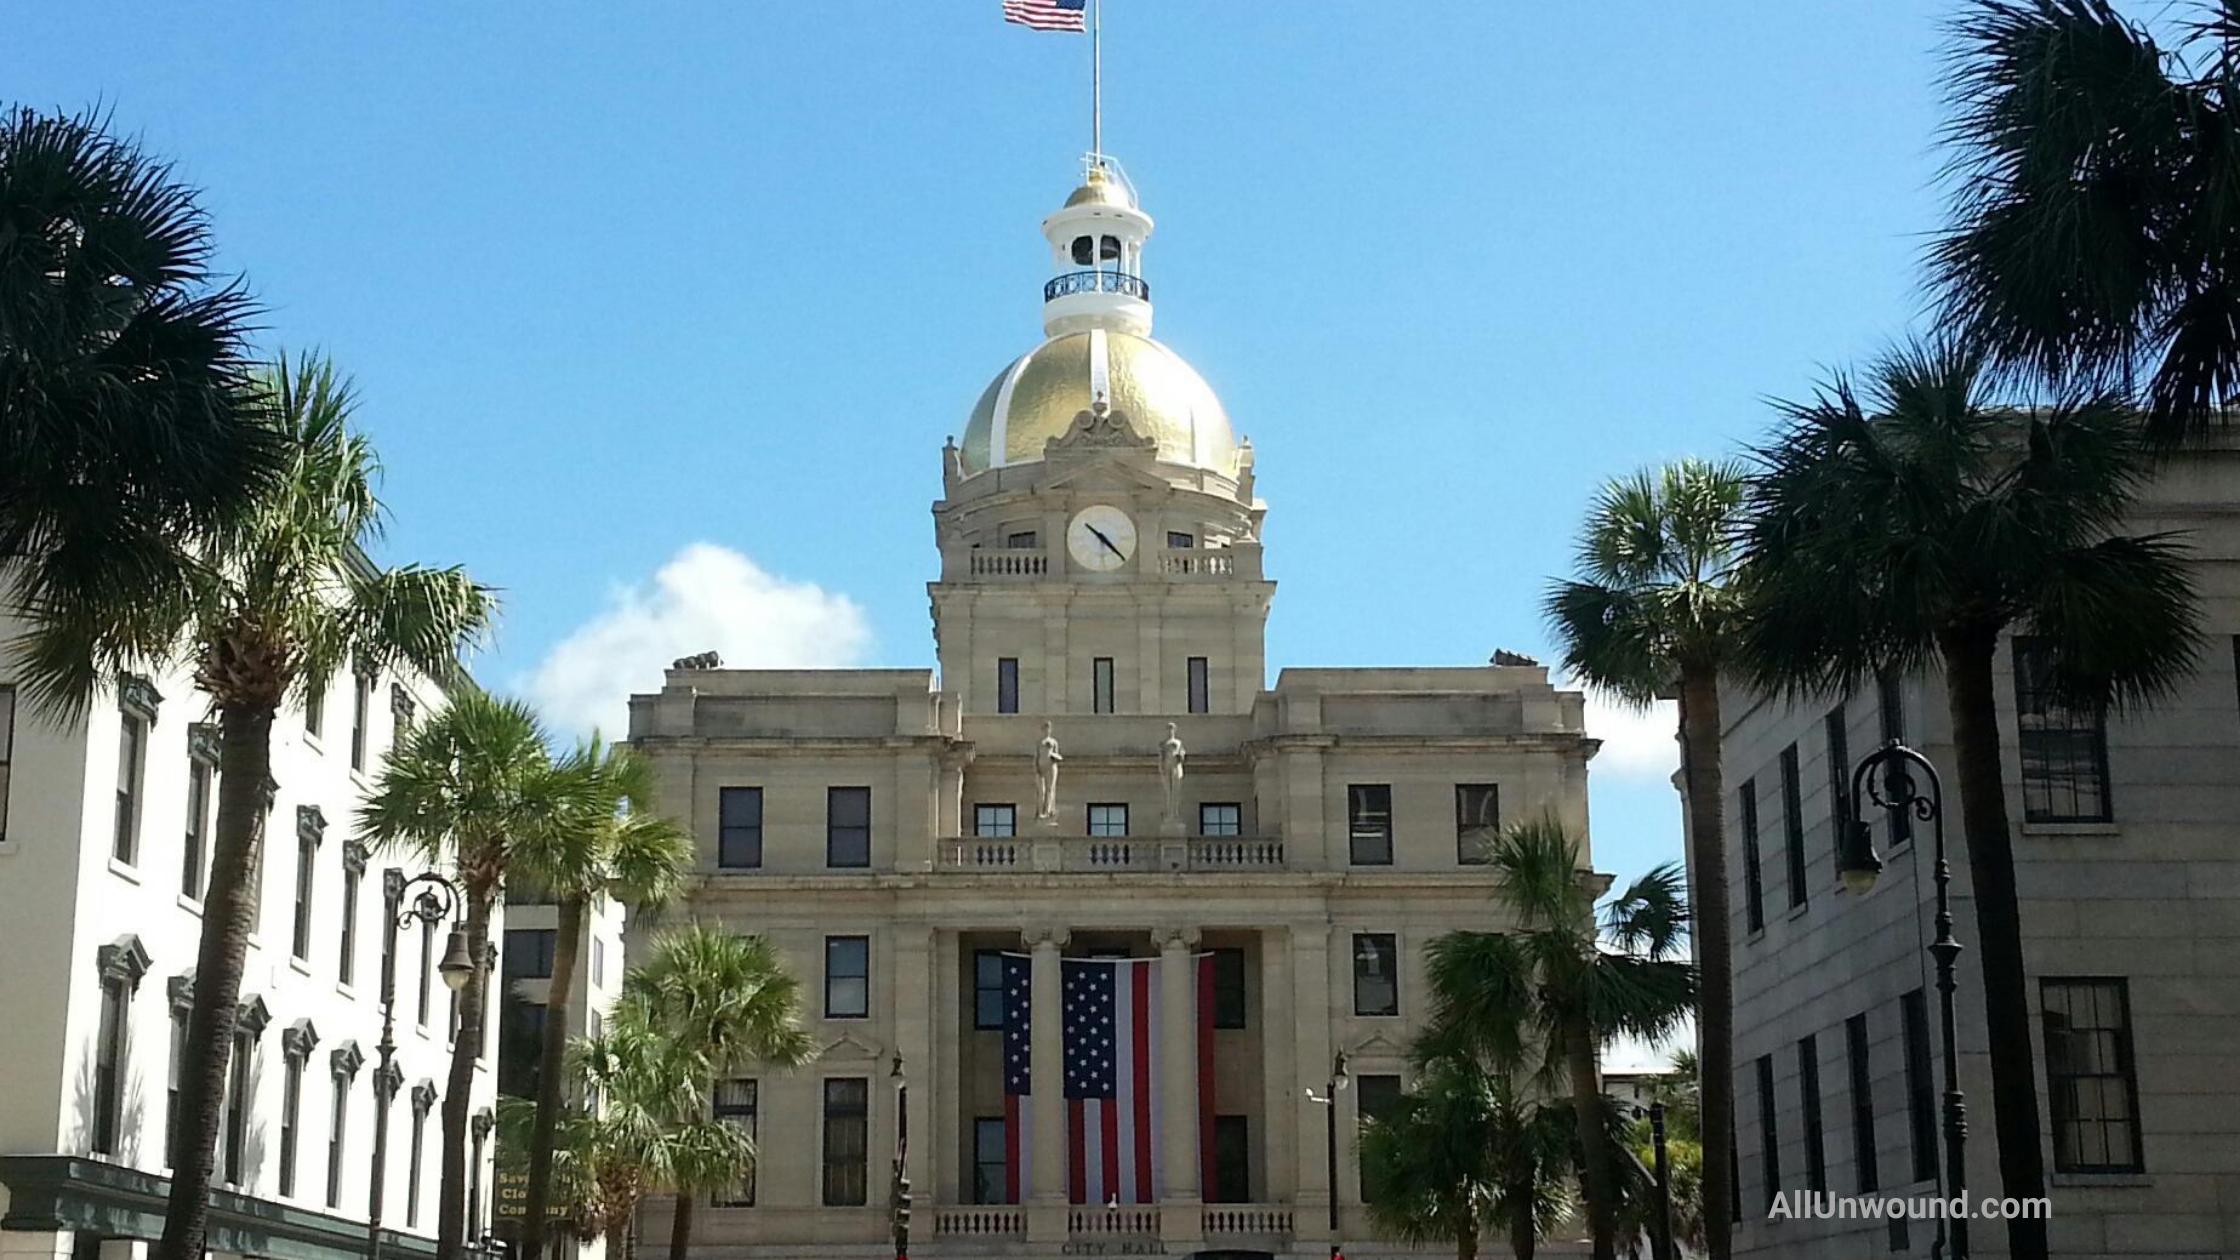 AllUnwound.com Savannah, GA city hall flying US flags